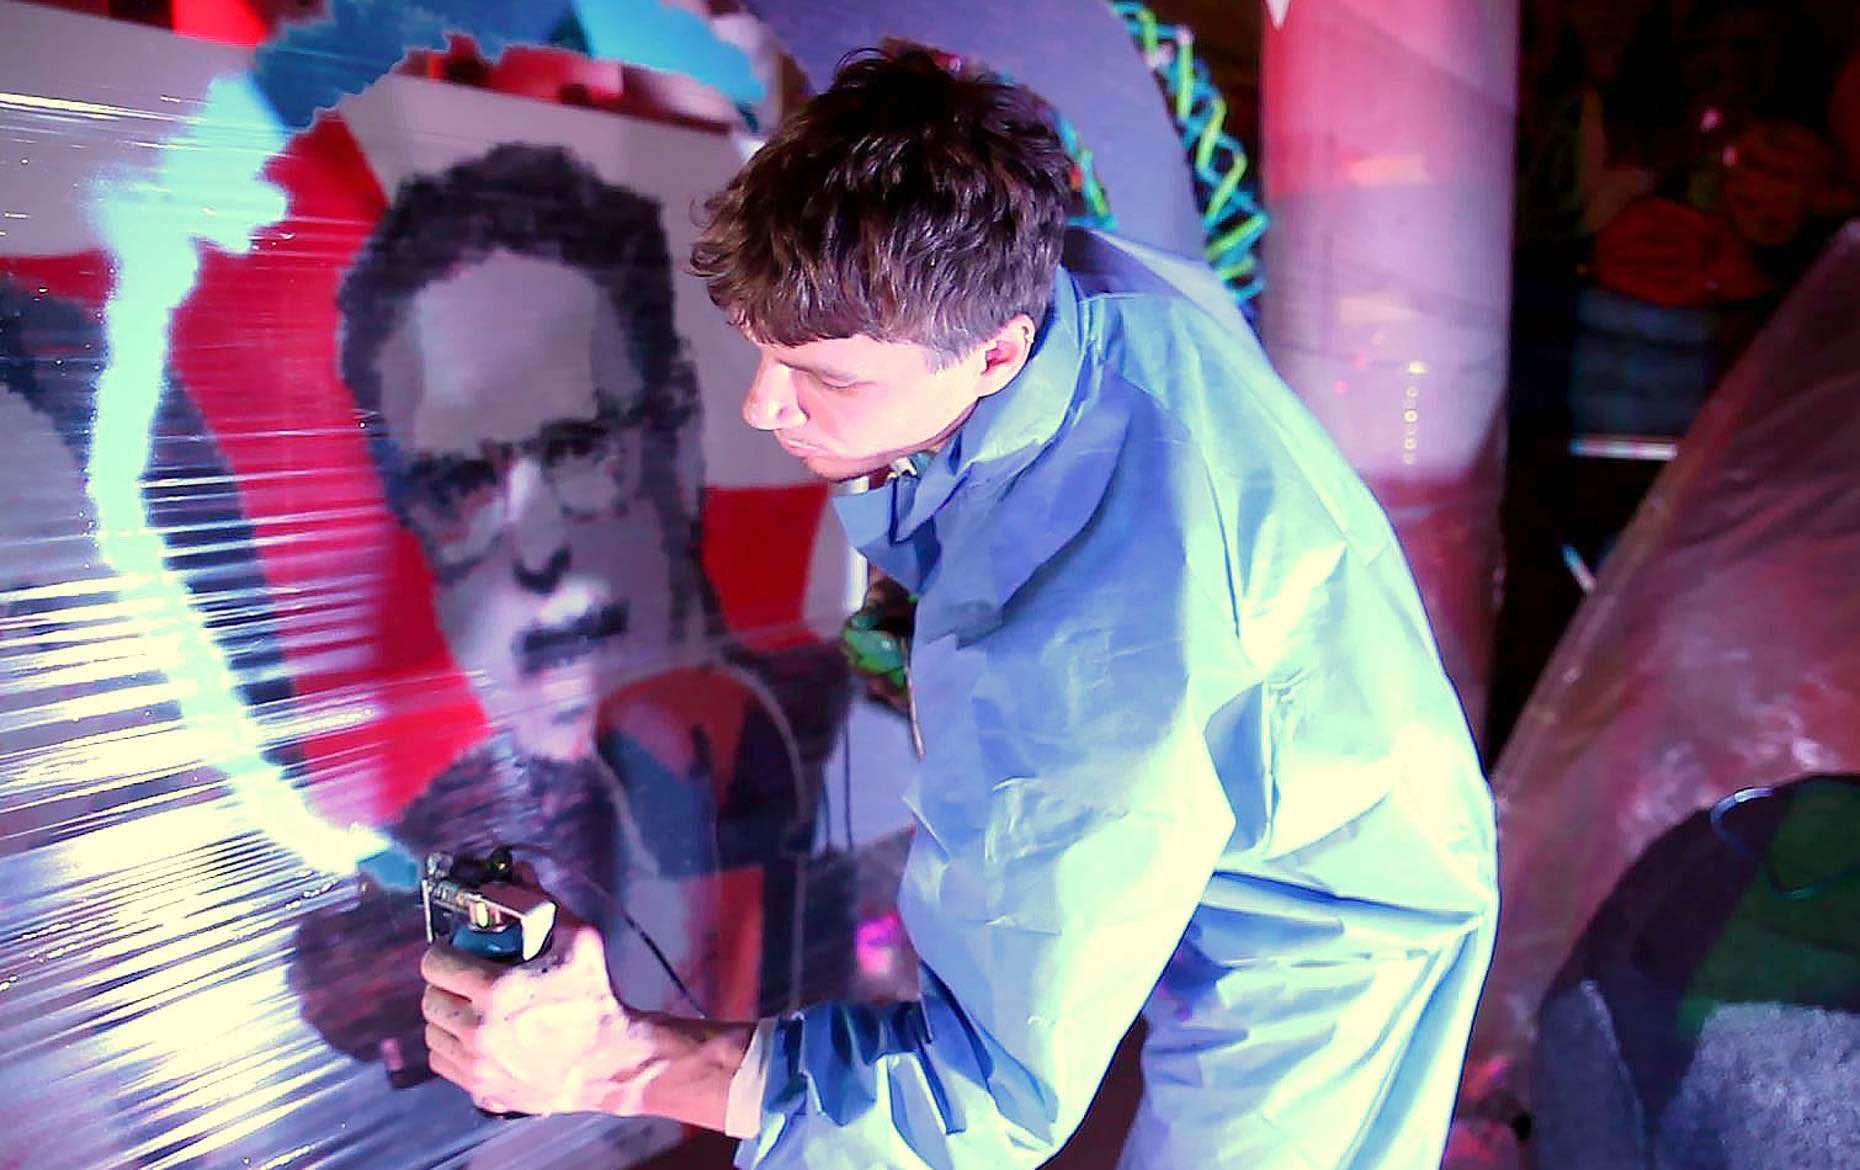 SprayPrinter Will Make Everyone Into A Graffiti Artist